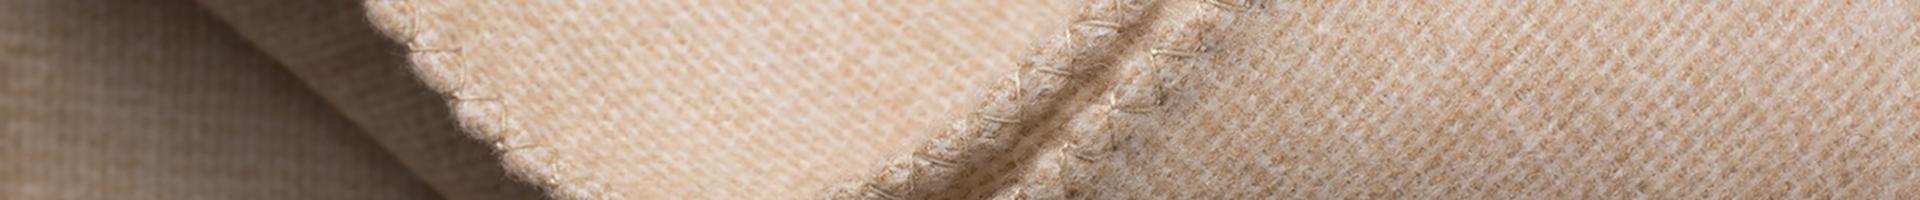 Linus silk in beige